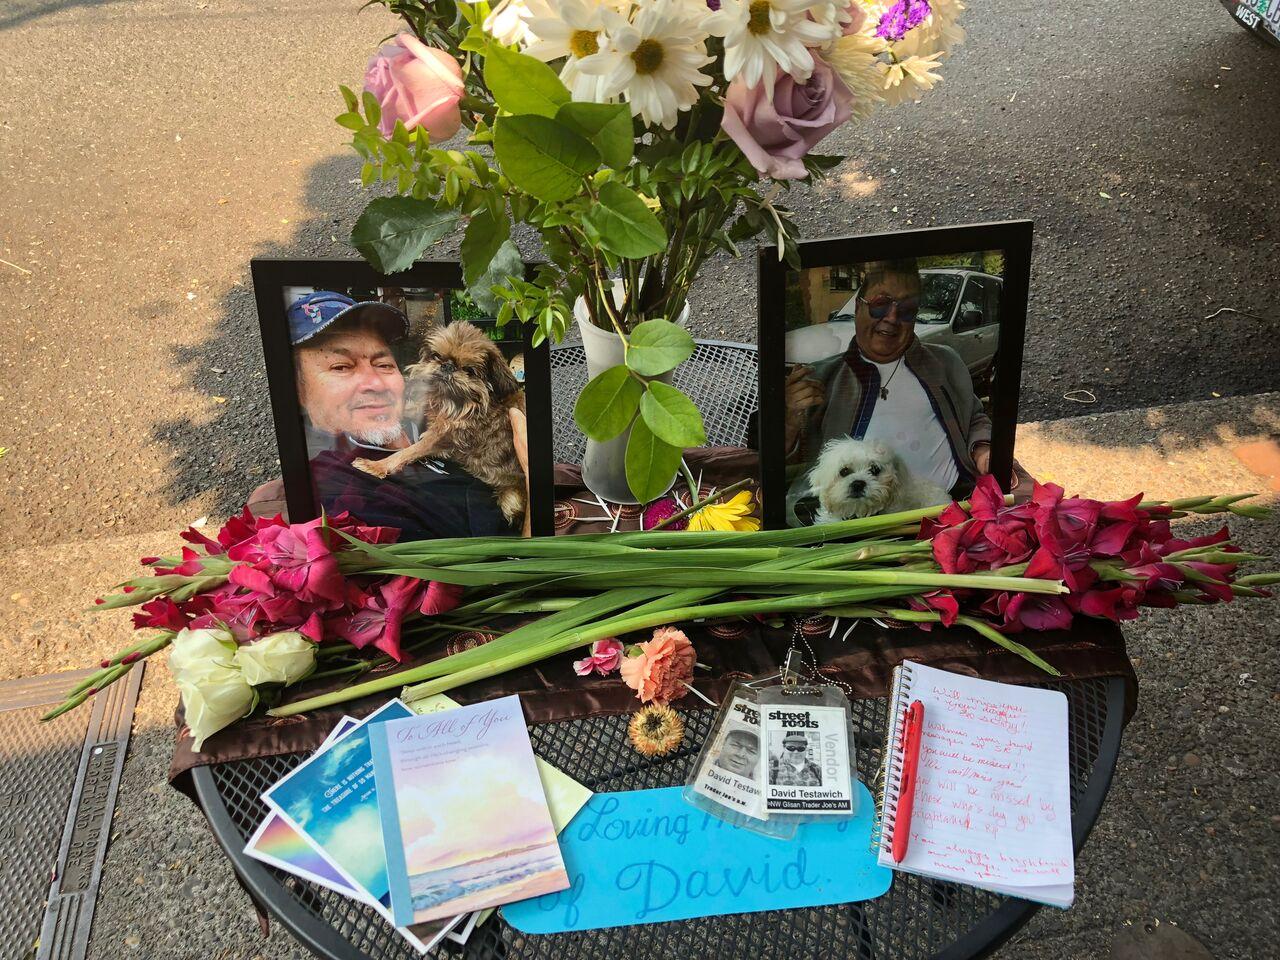 David Testawich memorial